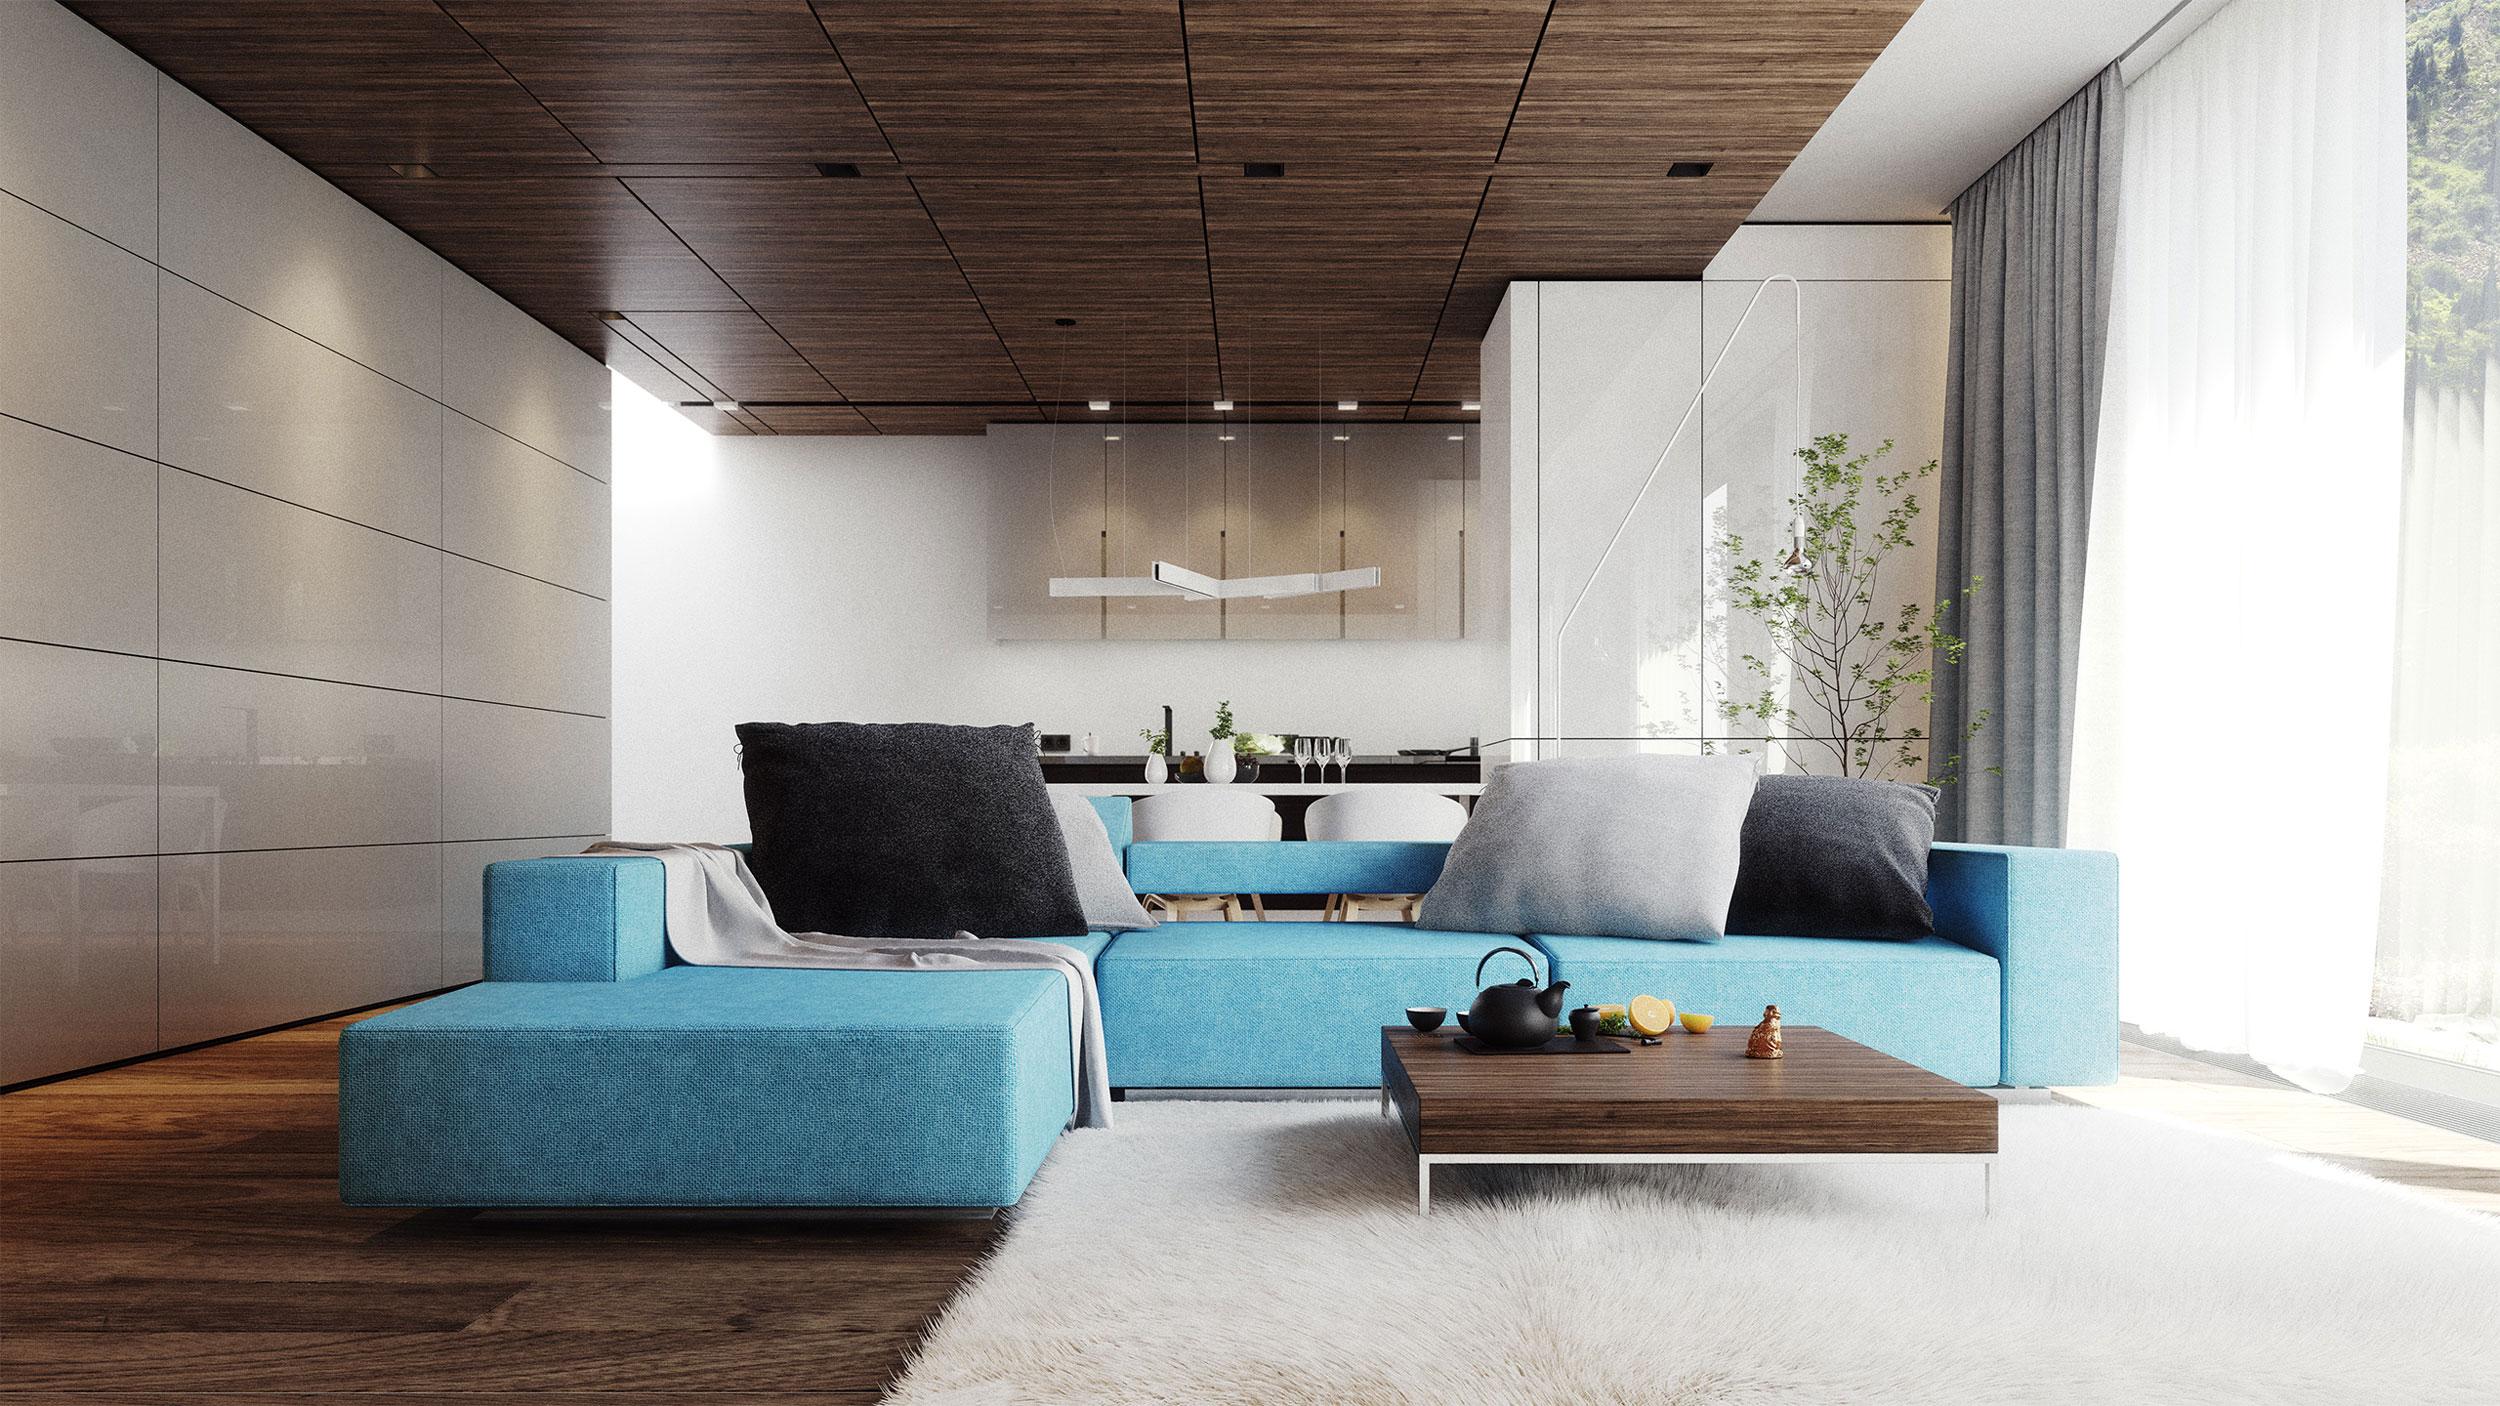 Salon z drewnem i błękitami